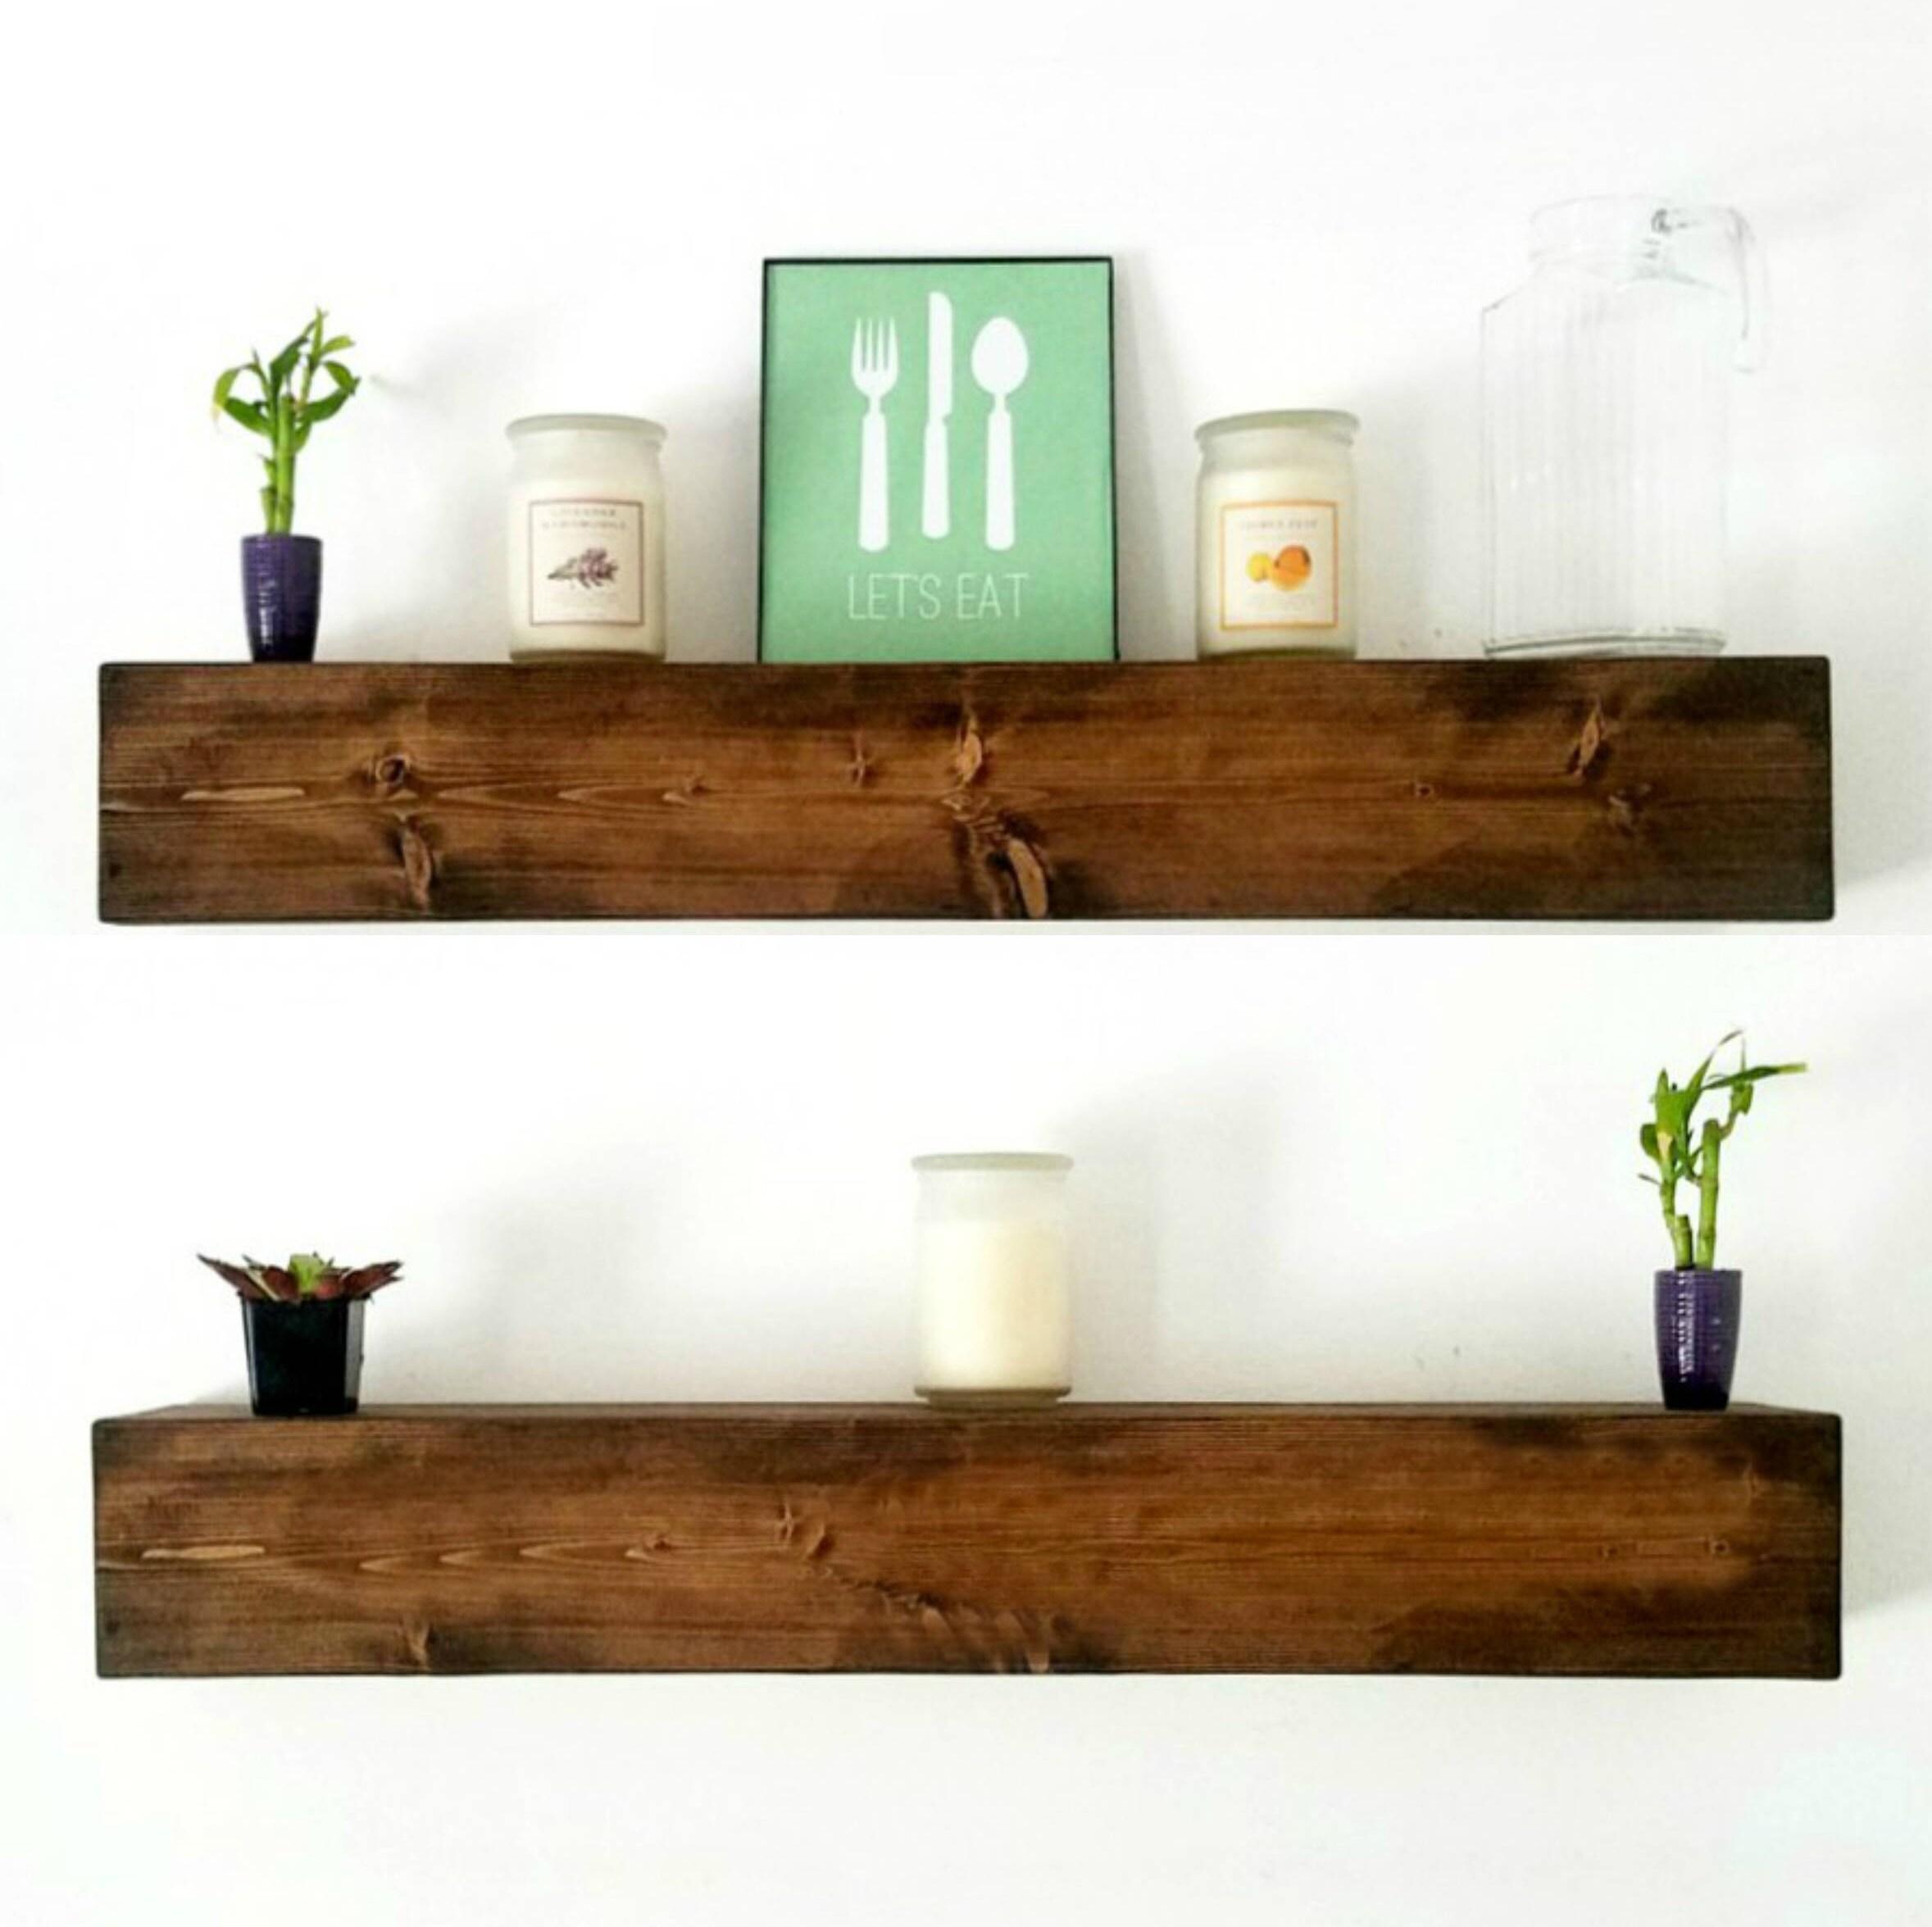 15 Great Diy Farmhouse Decor Ideas That You Must Try: Floating Shelf Farmhouse Decor Floating Shelves Rustic